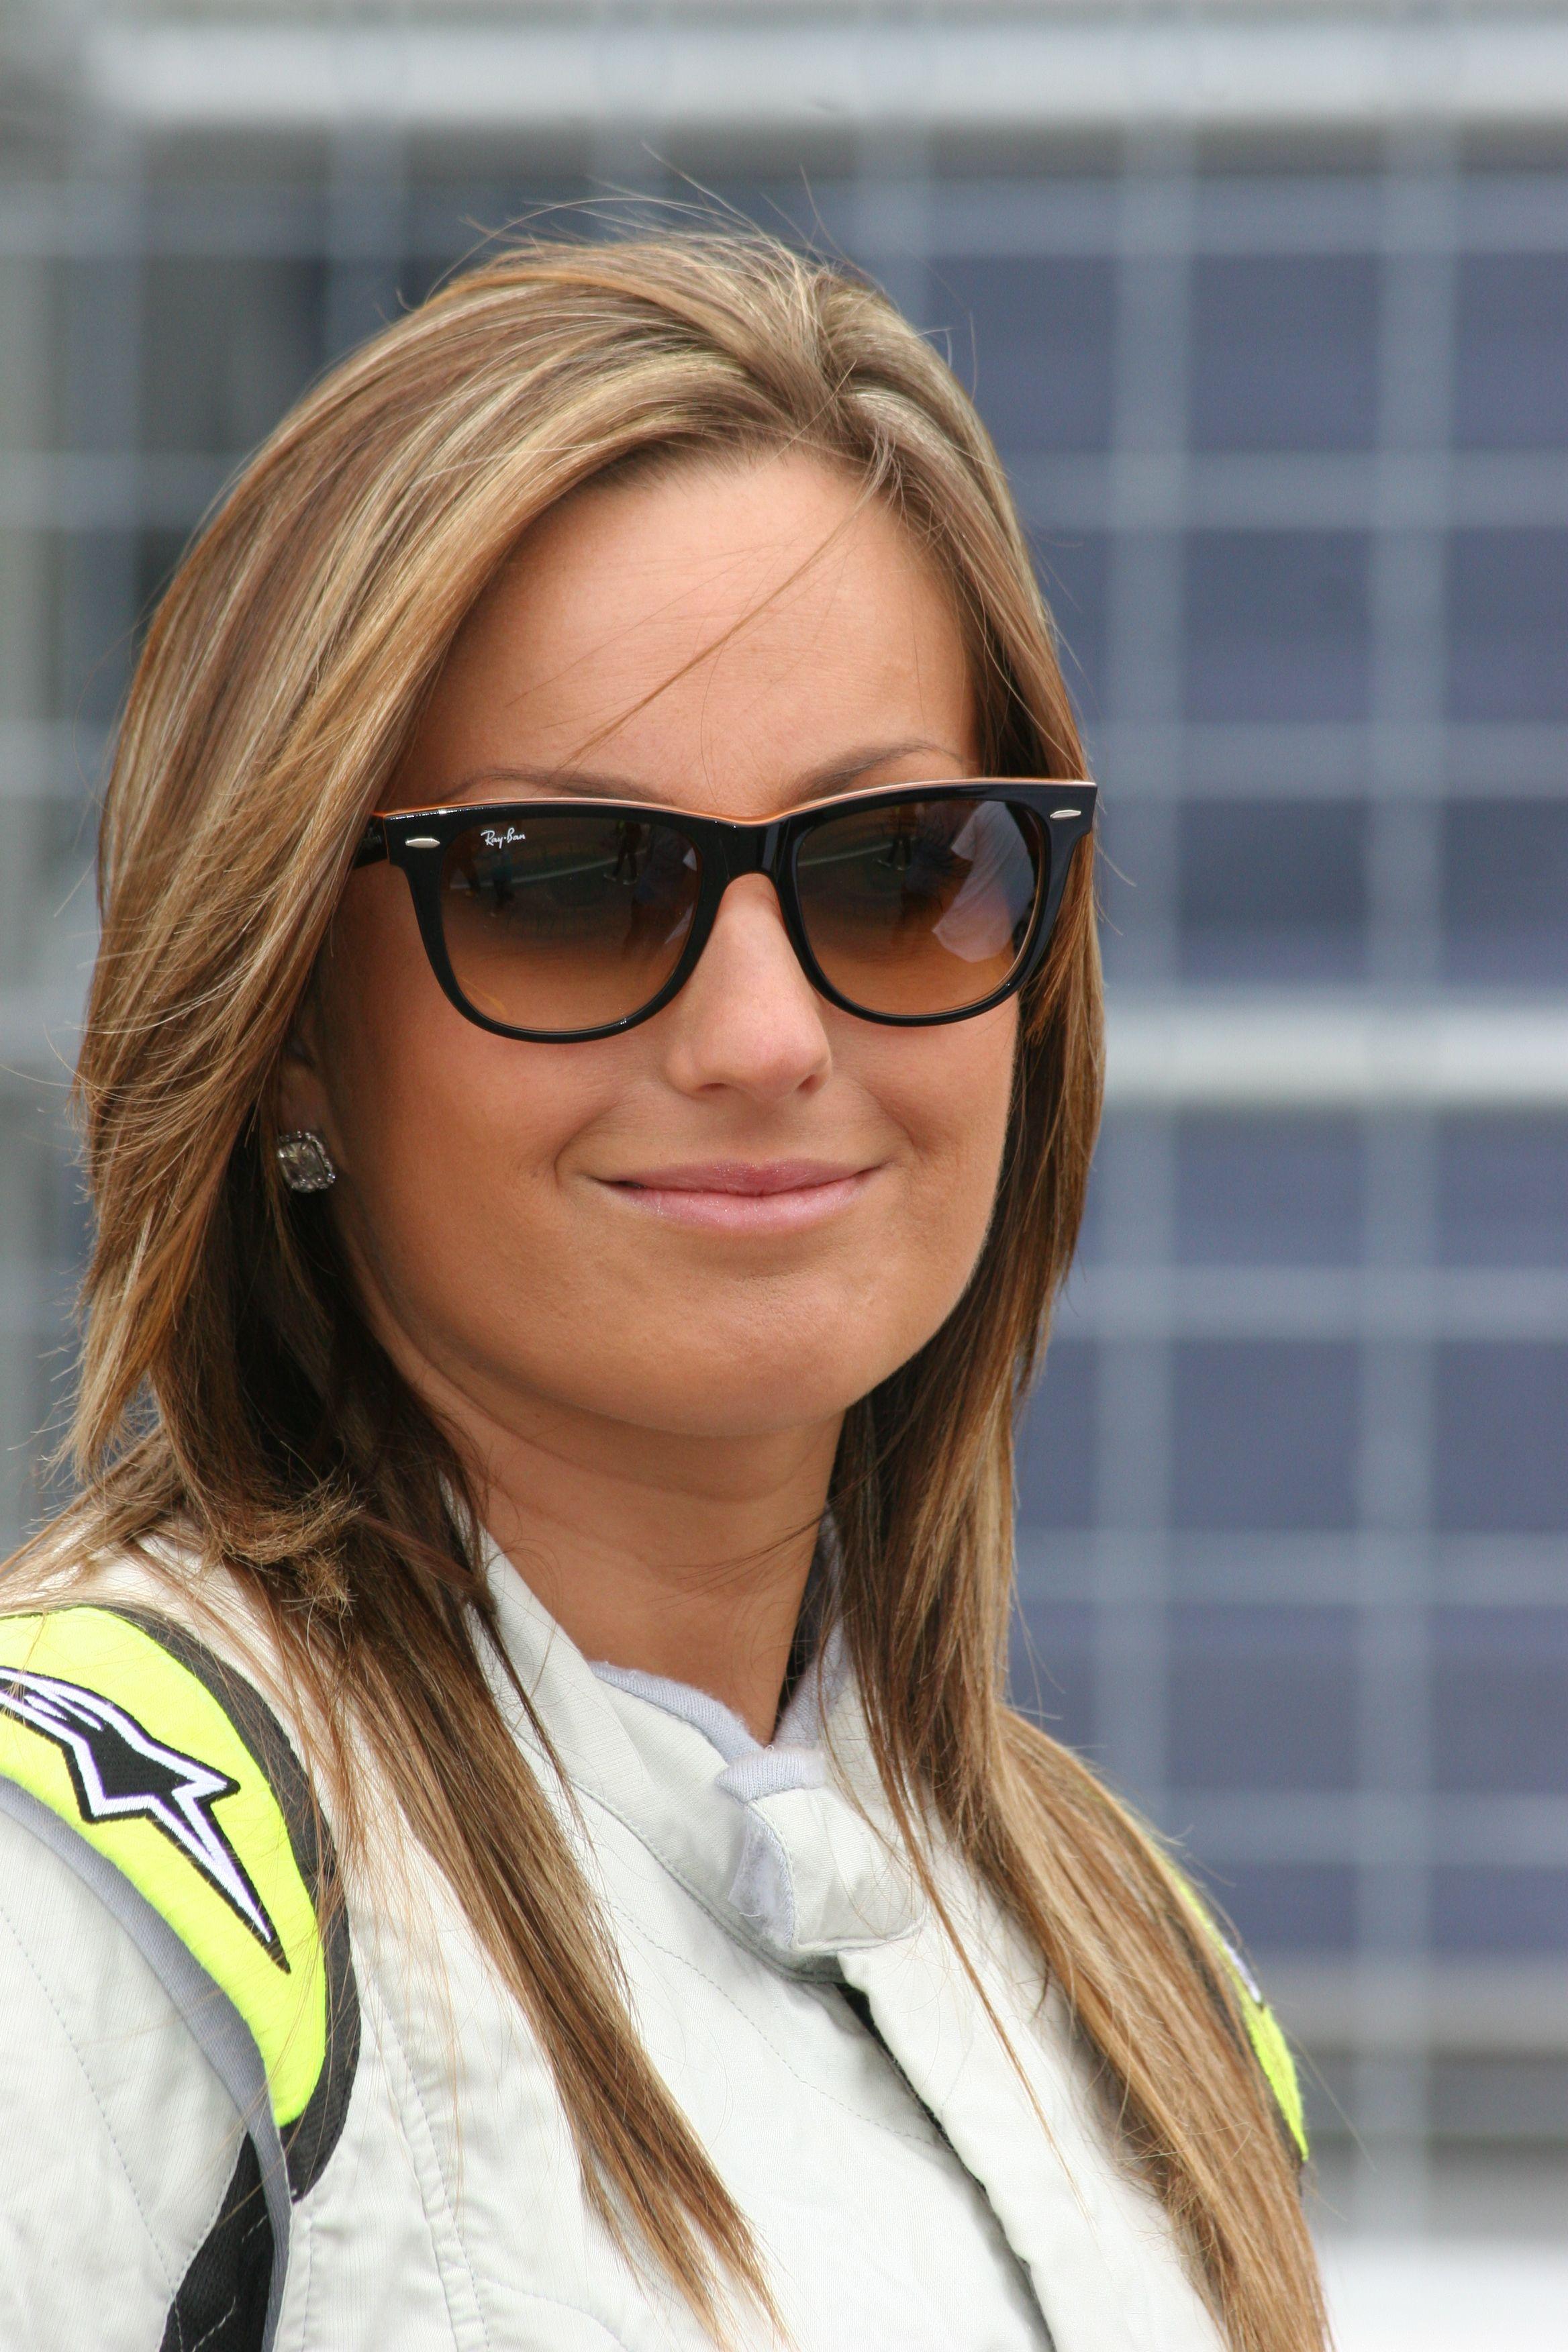 Valerie Chiasson, (Mont- Saint- Hilaire, QC), Lombardi Honda Racing, Honda Civic Si, CTCC, Grand Prix du Canada, Montreal, 5 JUNE 2014 (Photo by Ken Novak)